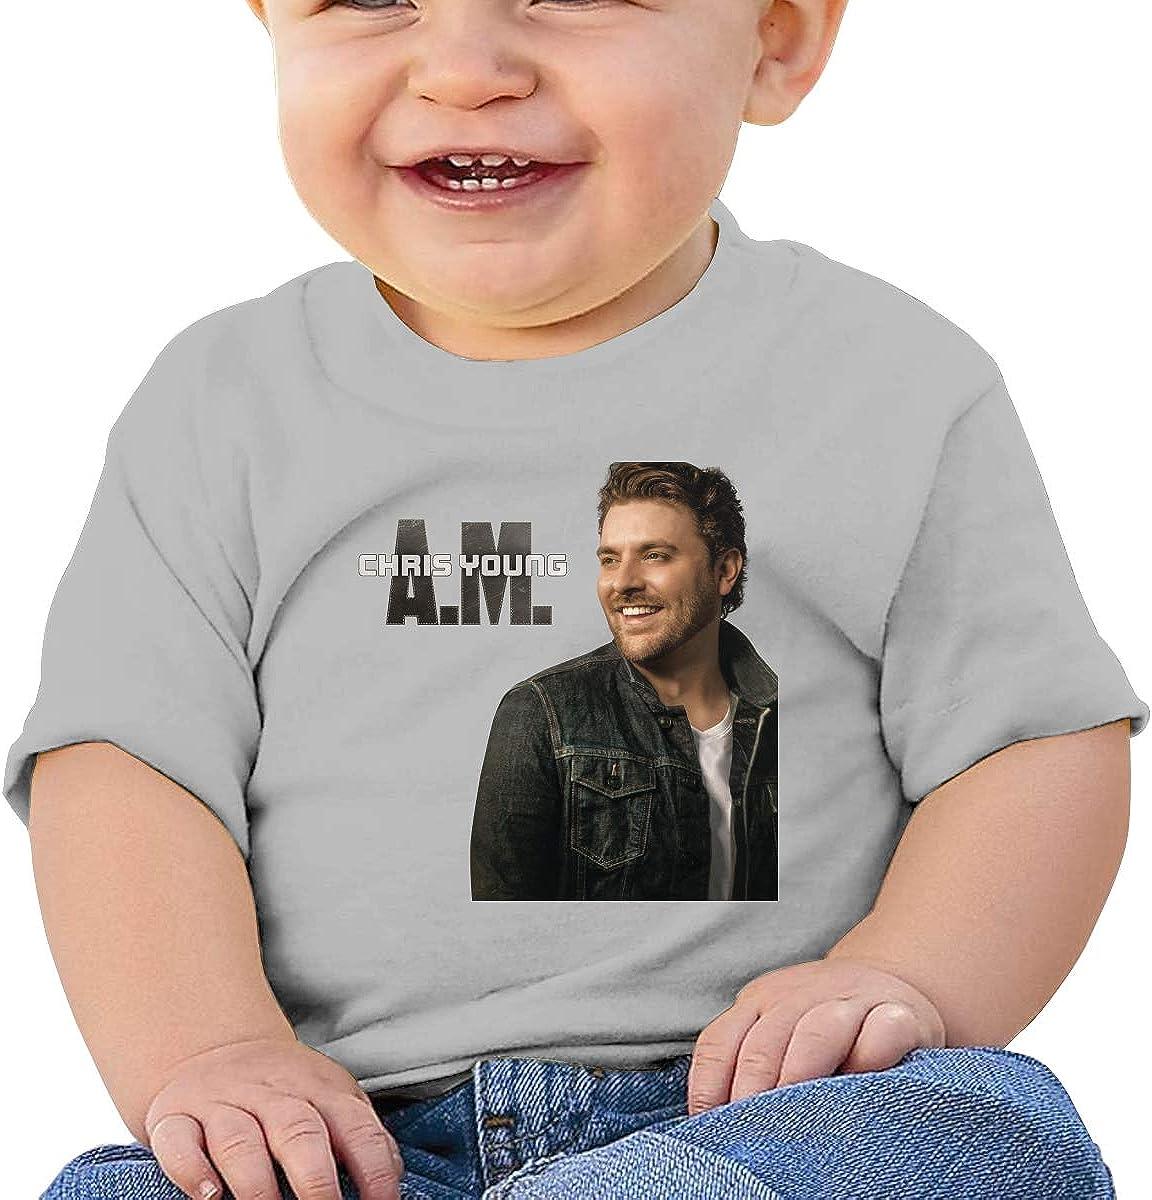 Honshang Chris Young A.M Cute Gray Tshirts for Infant T-Shirts